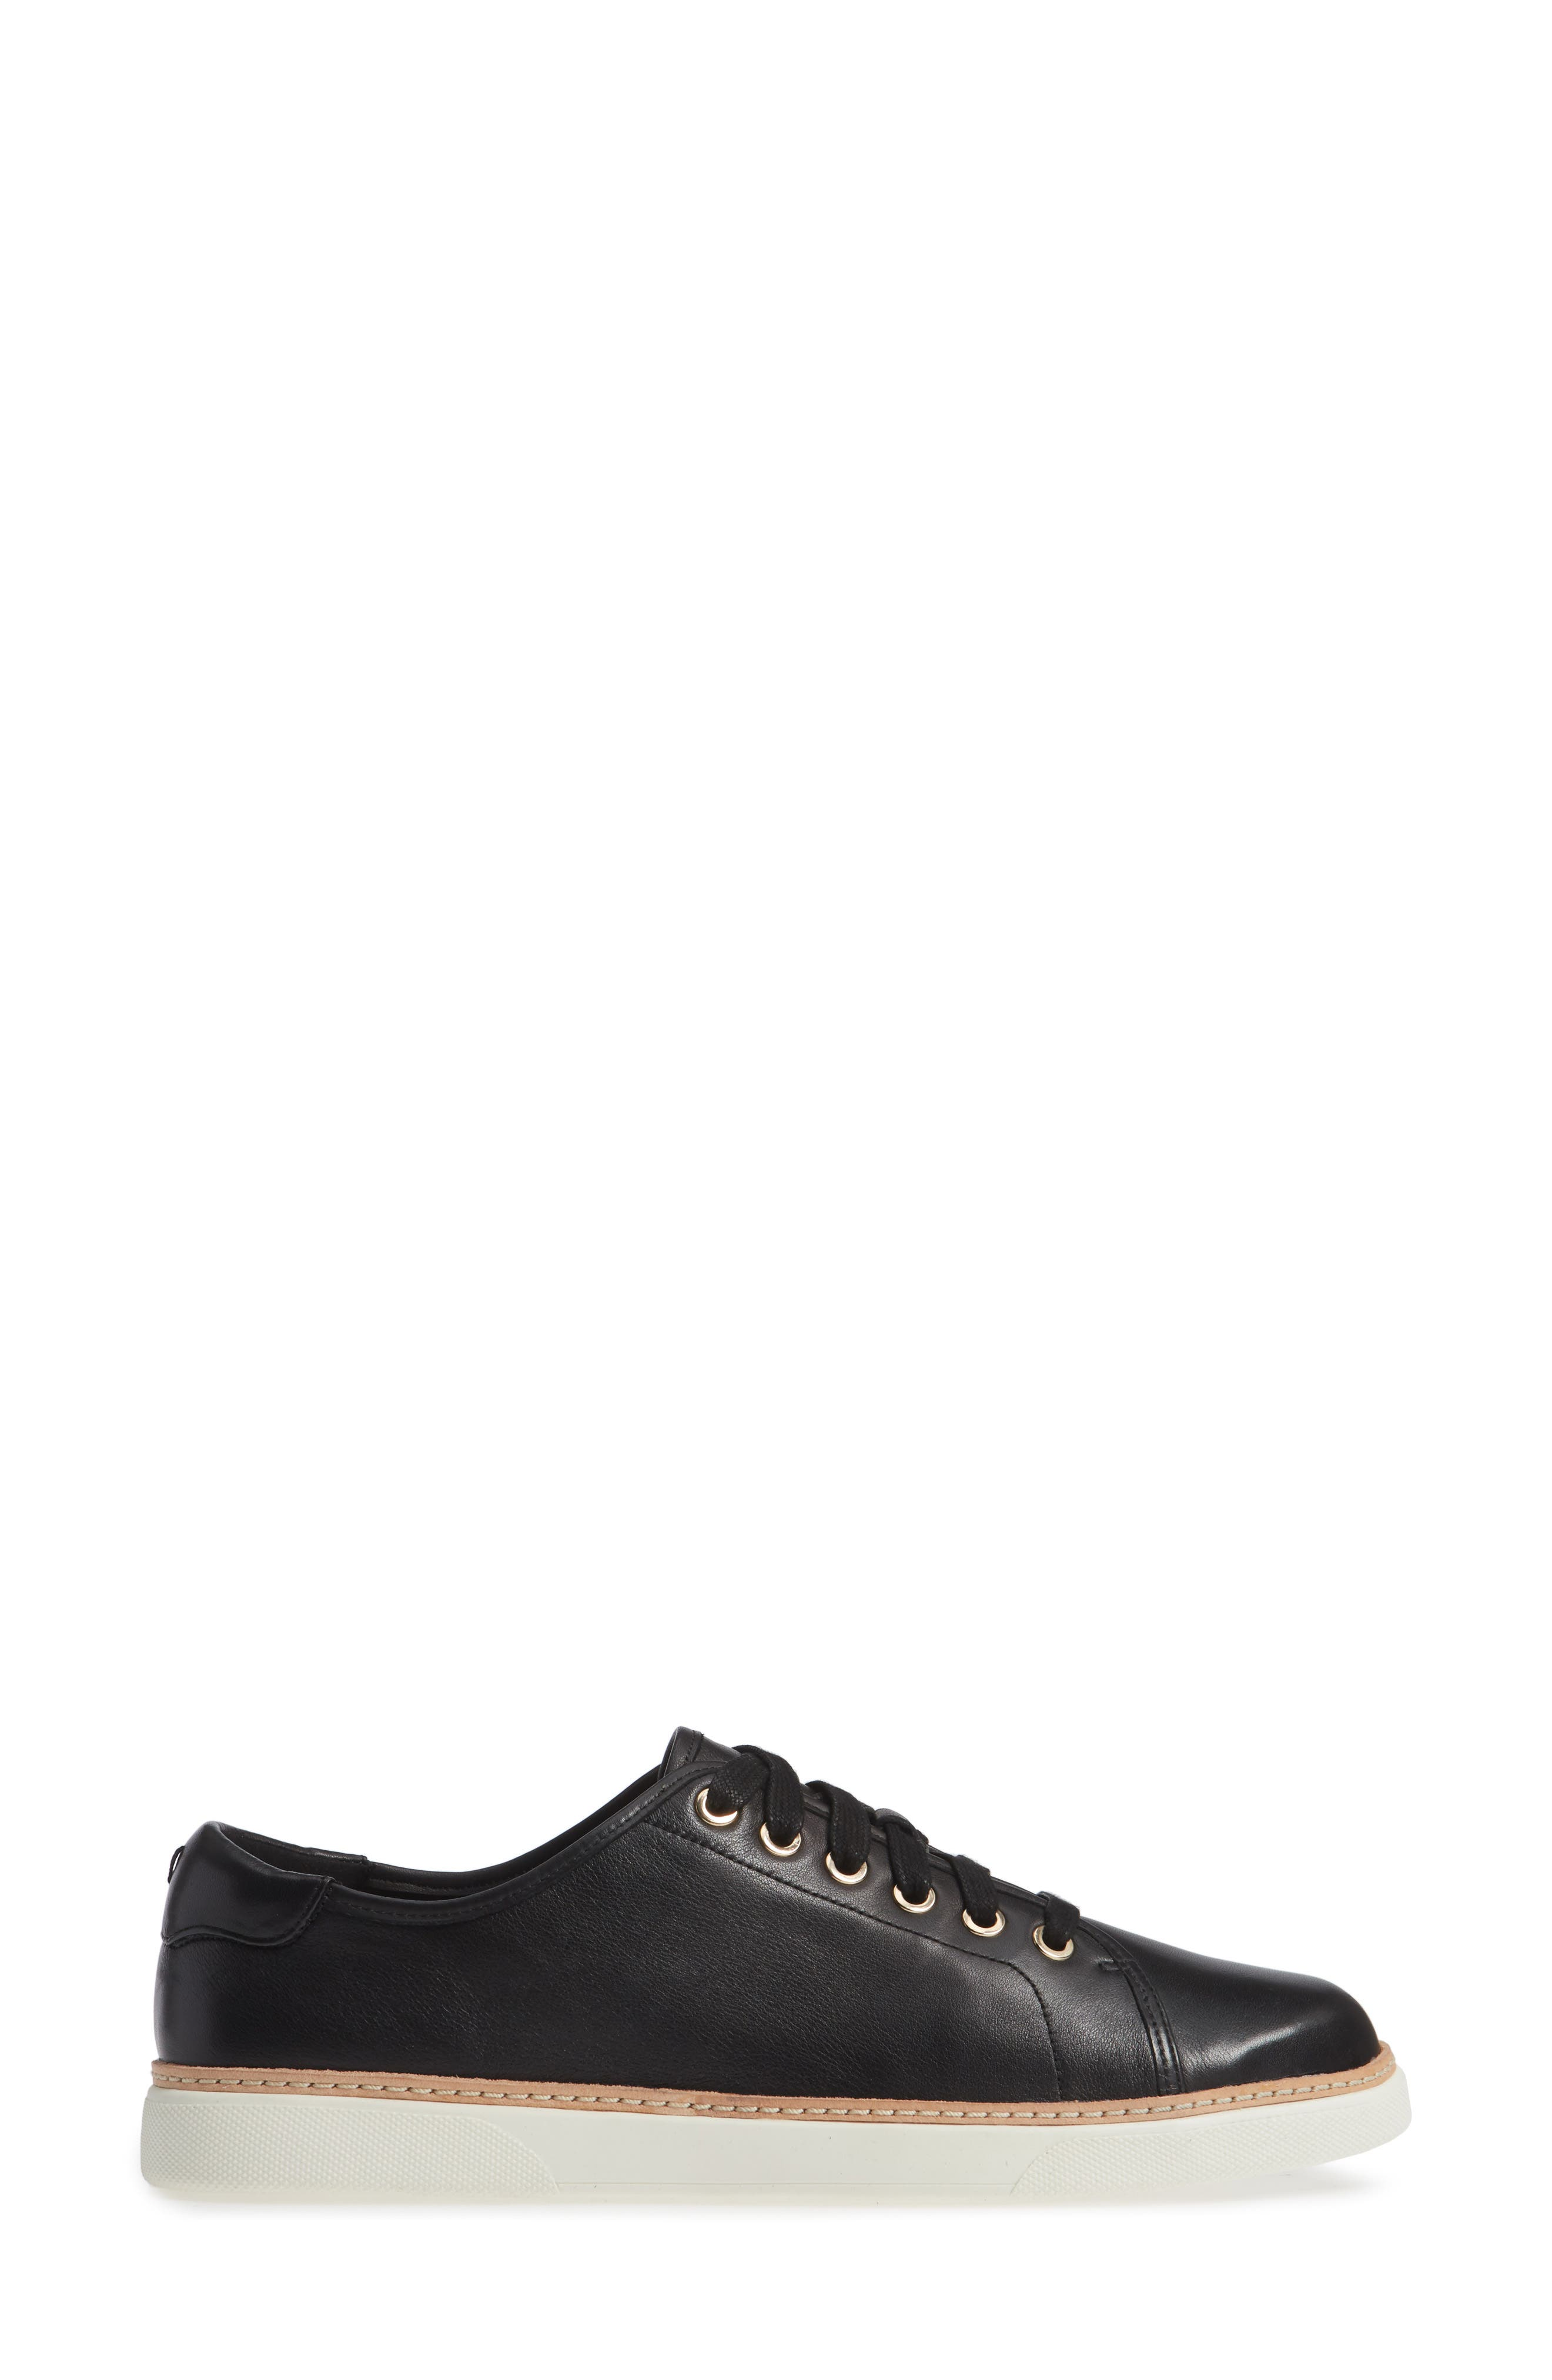 Leah Sneaker,                             Alternate thumbnail 3, color,                             BLACK LEATHER